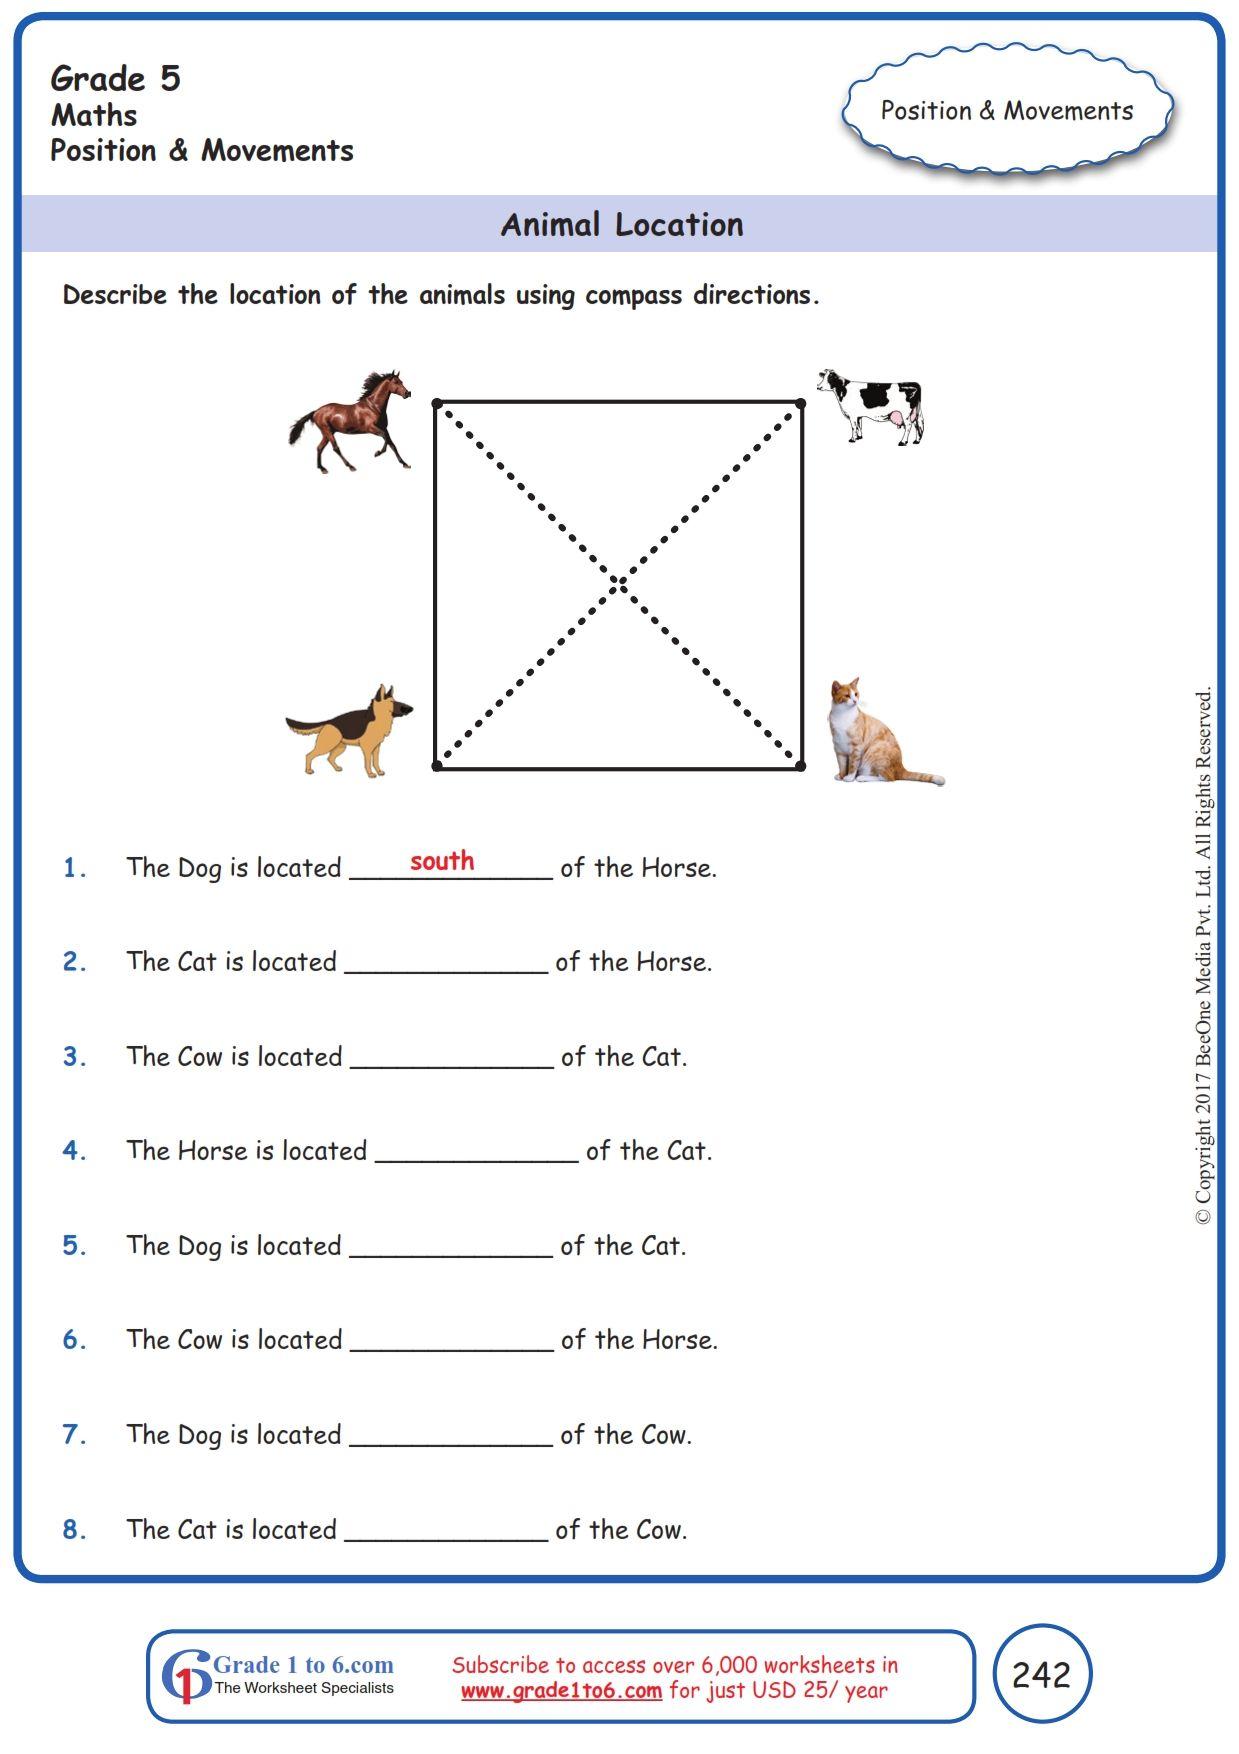 small resolution of Worksheet Grade 5 Math Animal Location   Grade 5 math worksheets